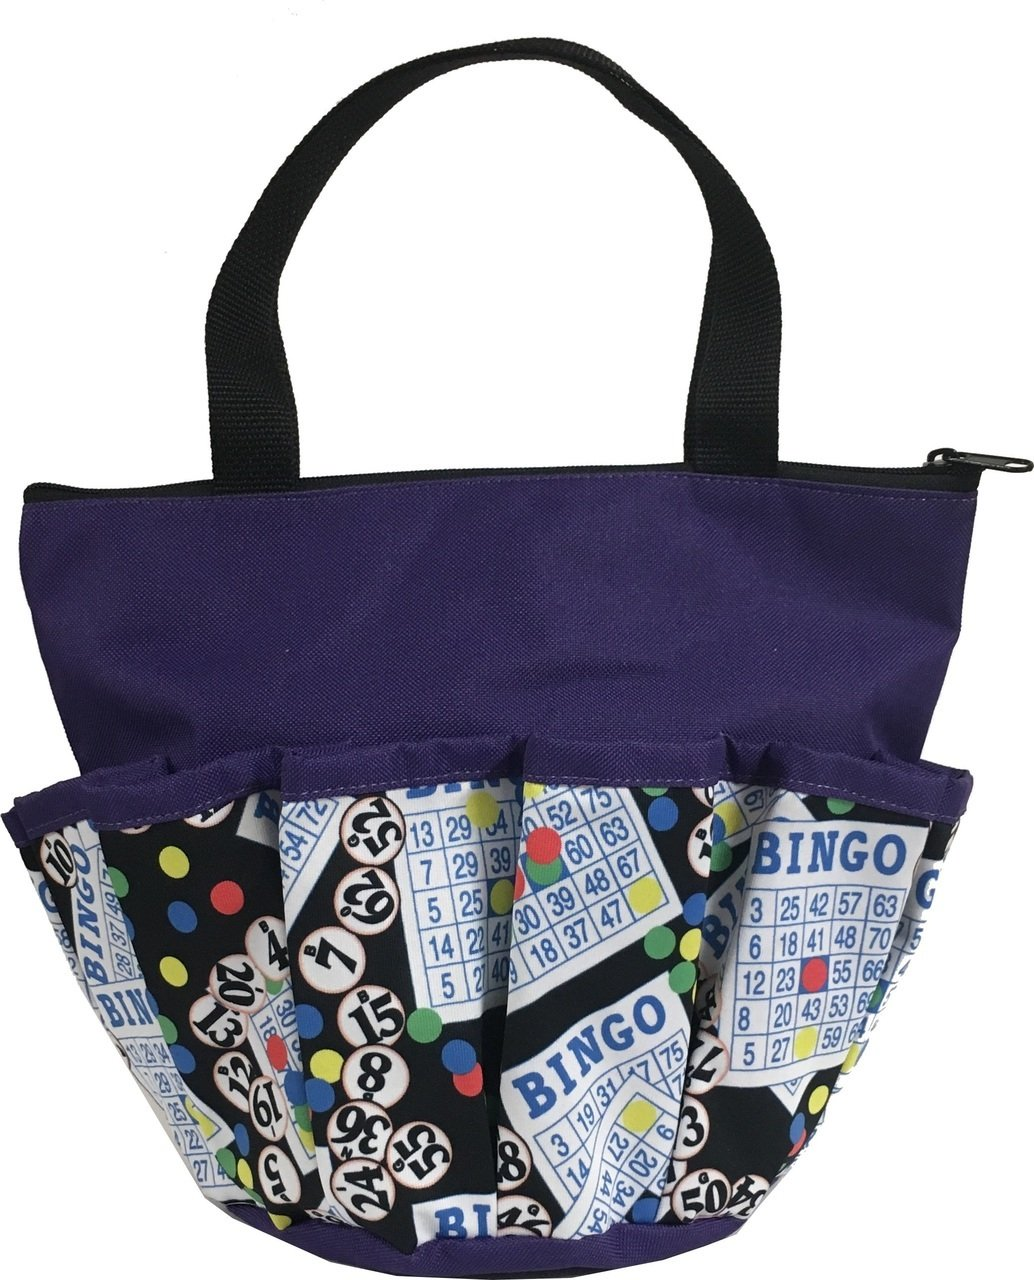 10 Pocket Bingo #1 Purple Zipper Bingo Bag